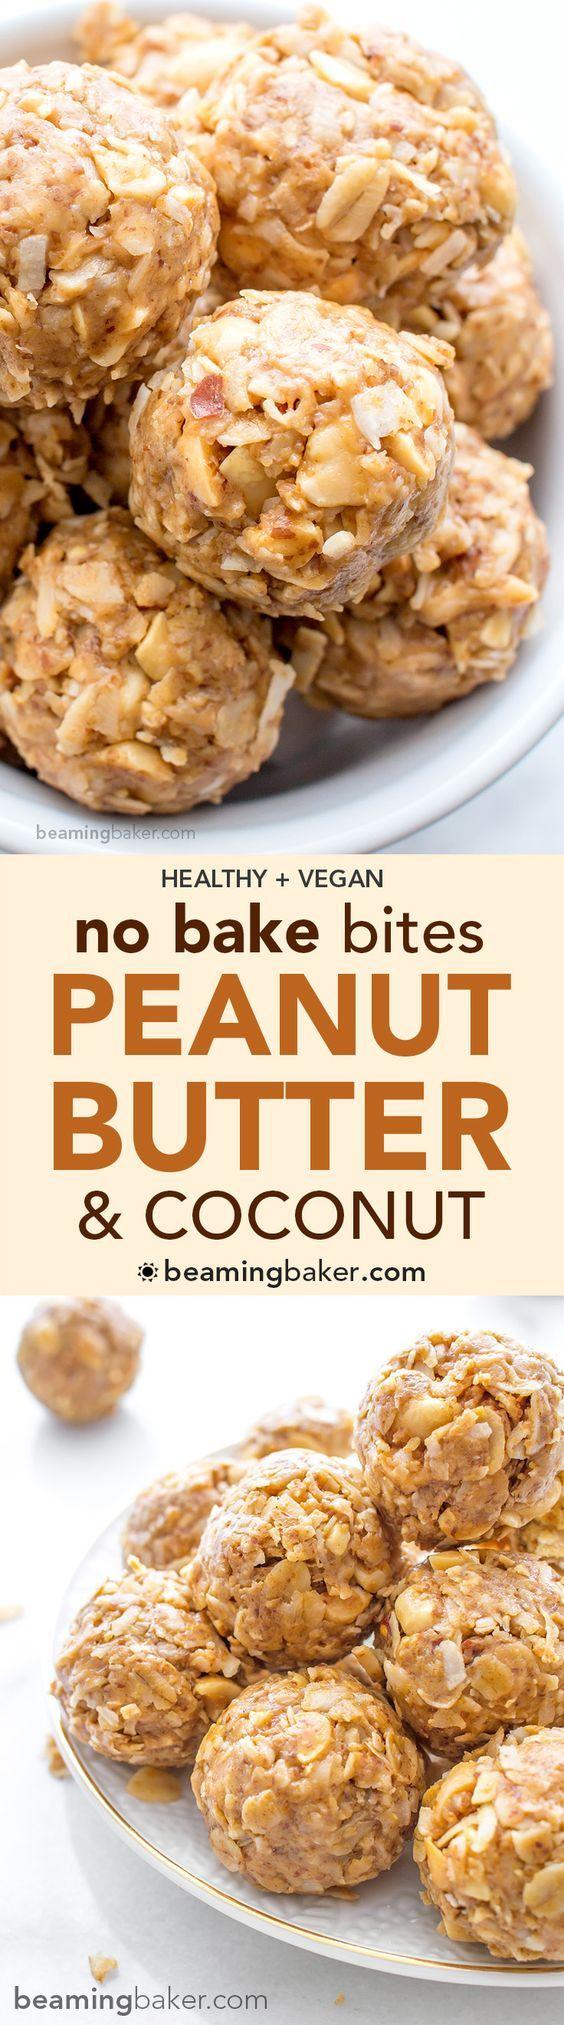 No Bake Gluten-Free Peanut Butter Coconut Bites Recipe